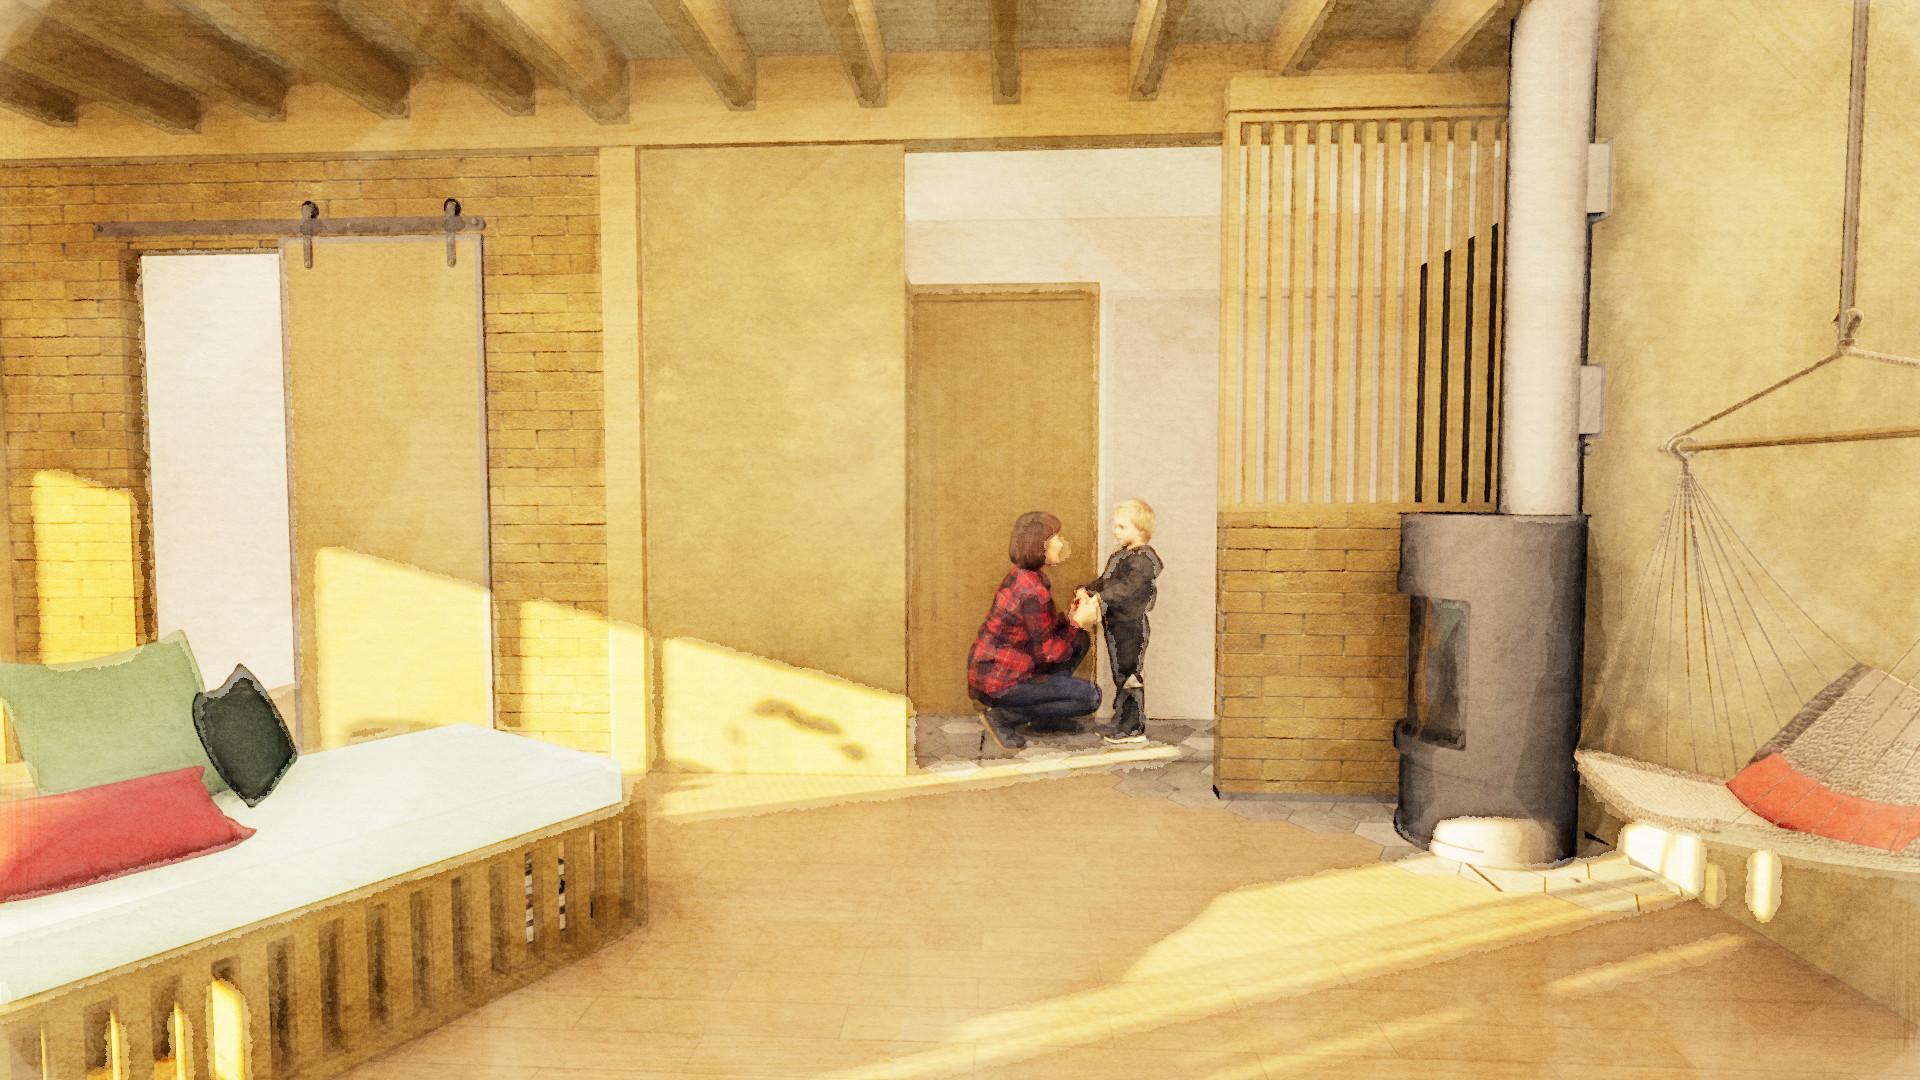 Hirundo-Architecture_Projet B&R_04.jpg